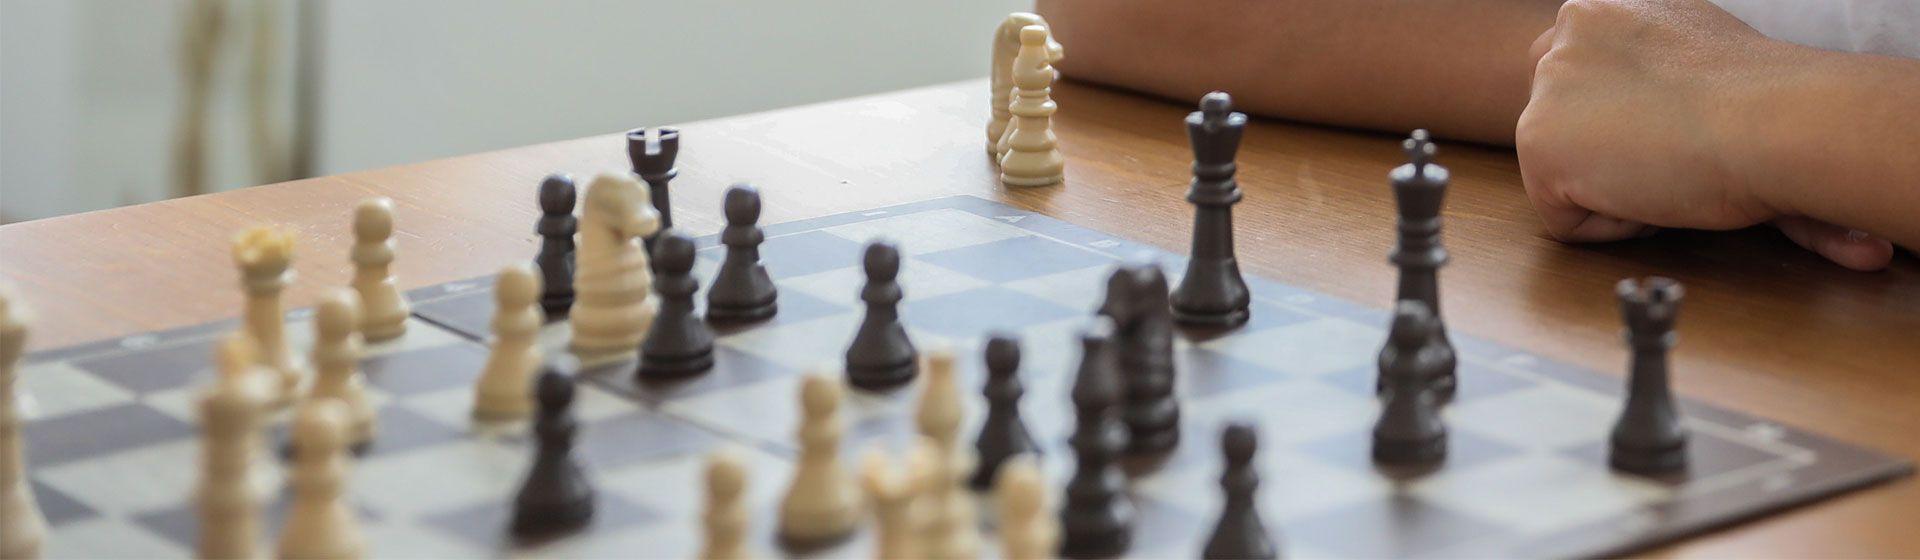 Aberturas de xadrez: aprenda as diferentes táticas para começar o jogo